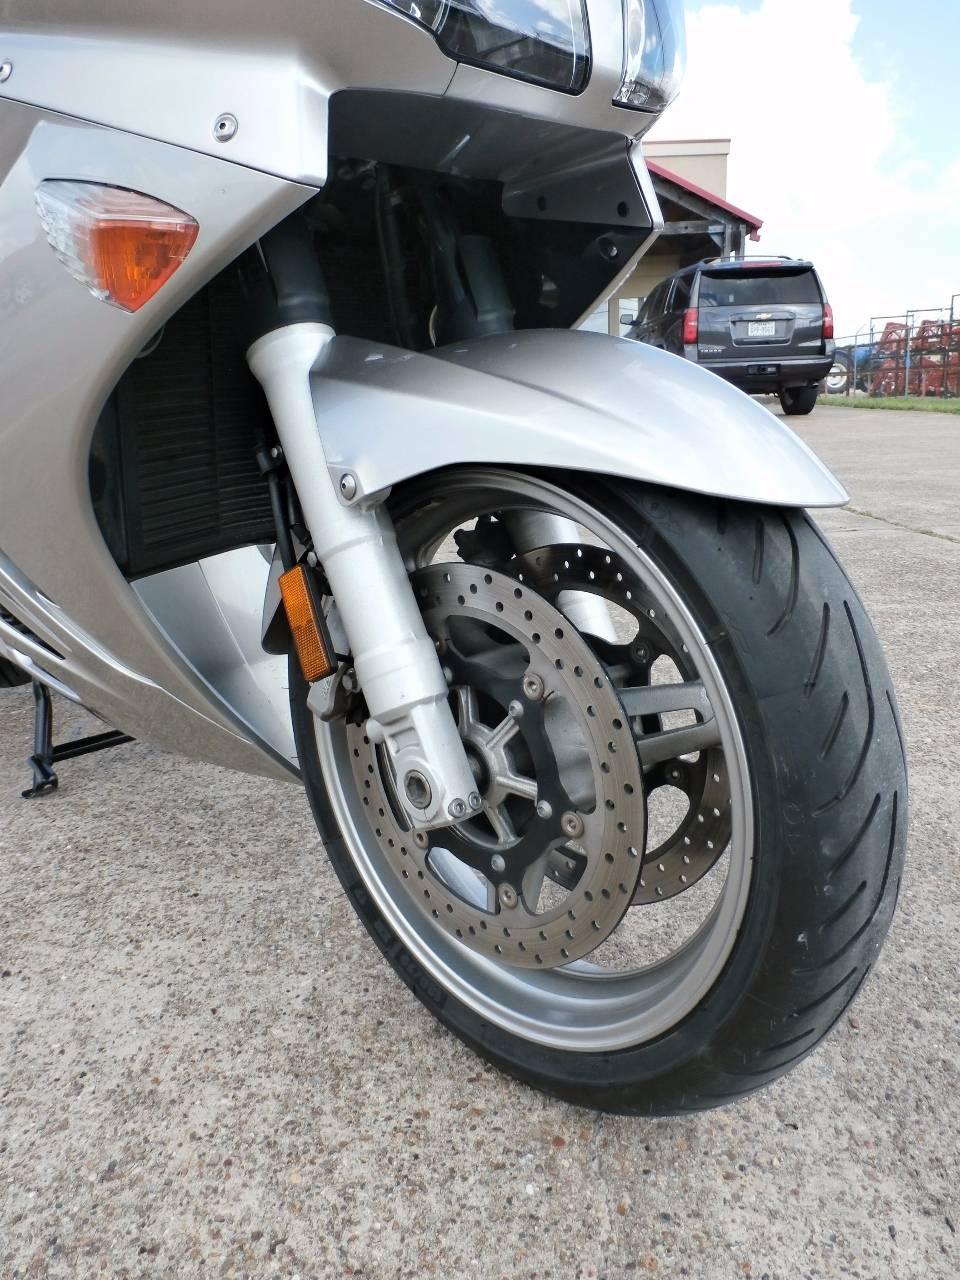 2011 Yamaha FJR1300A 4